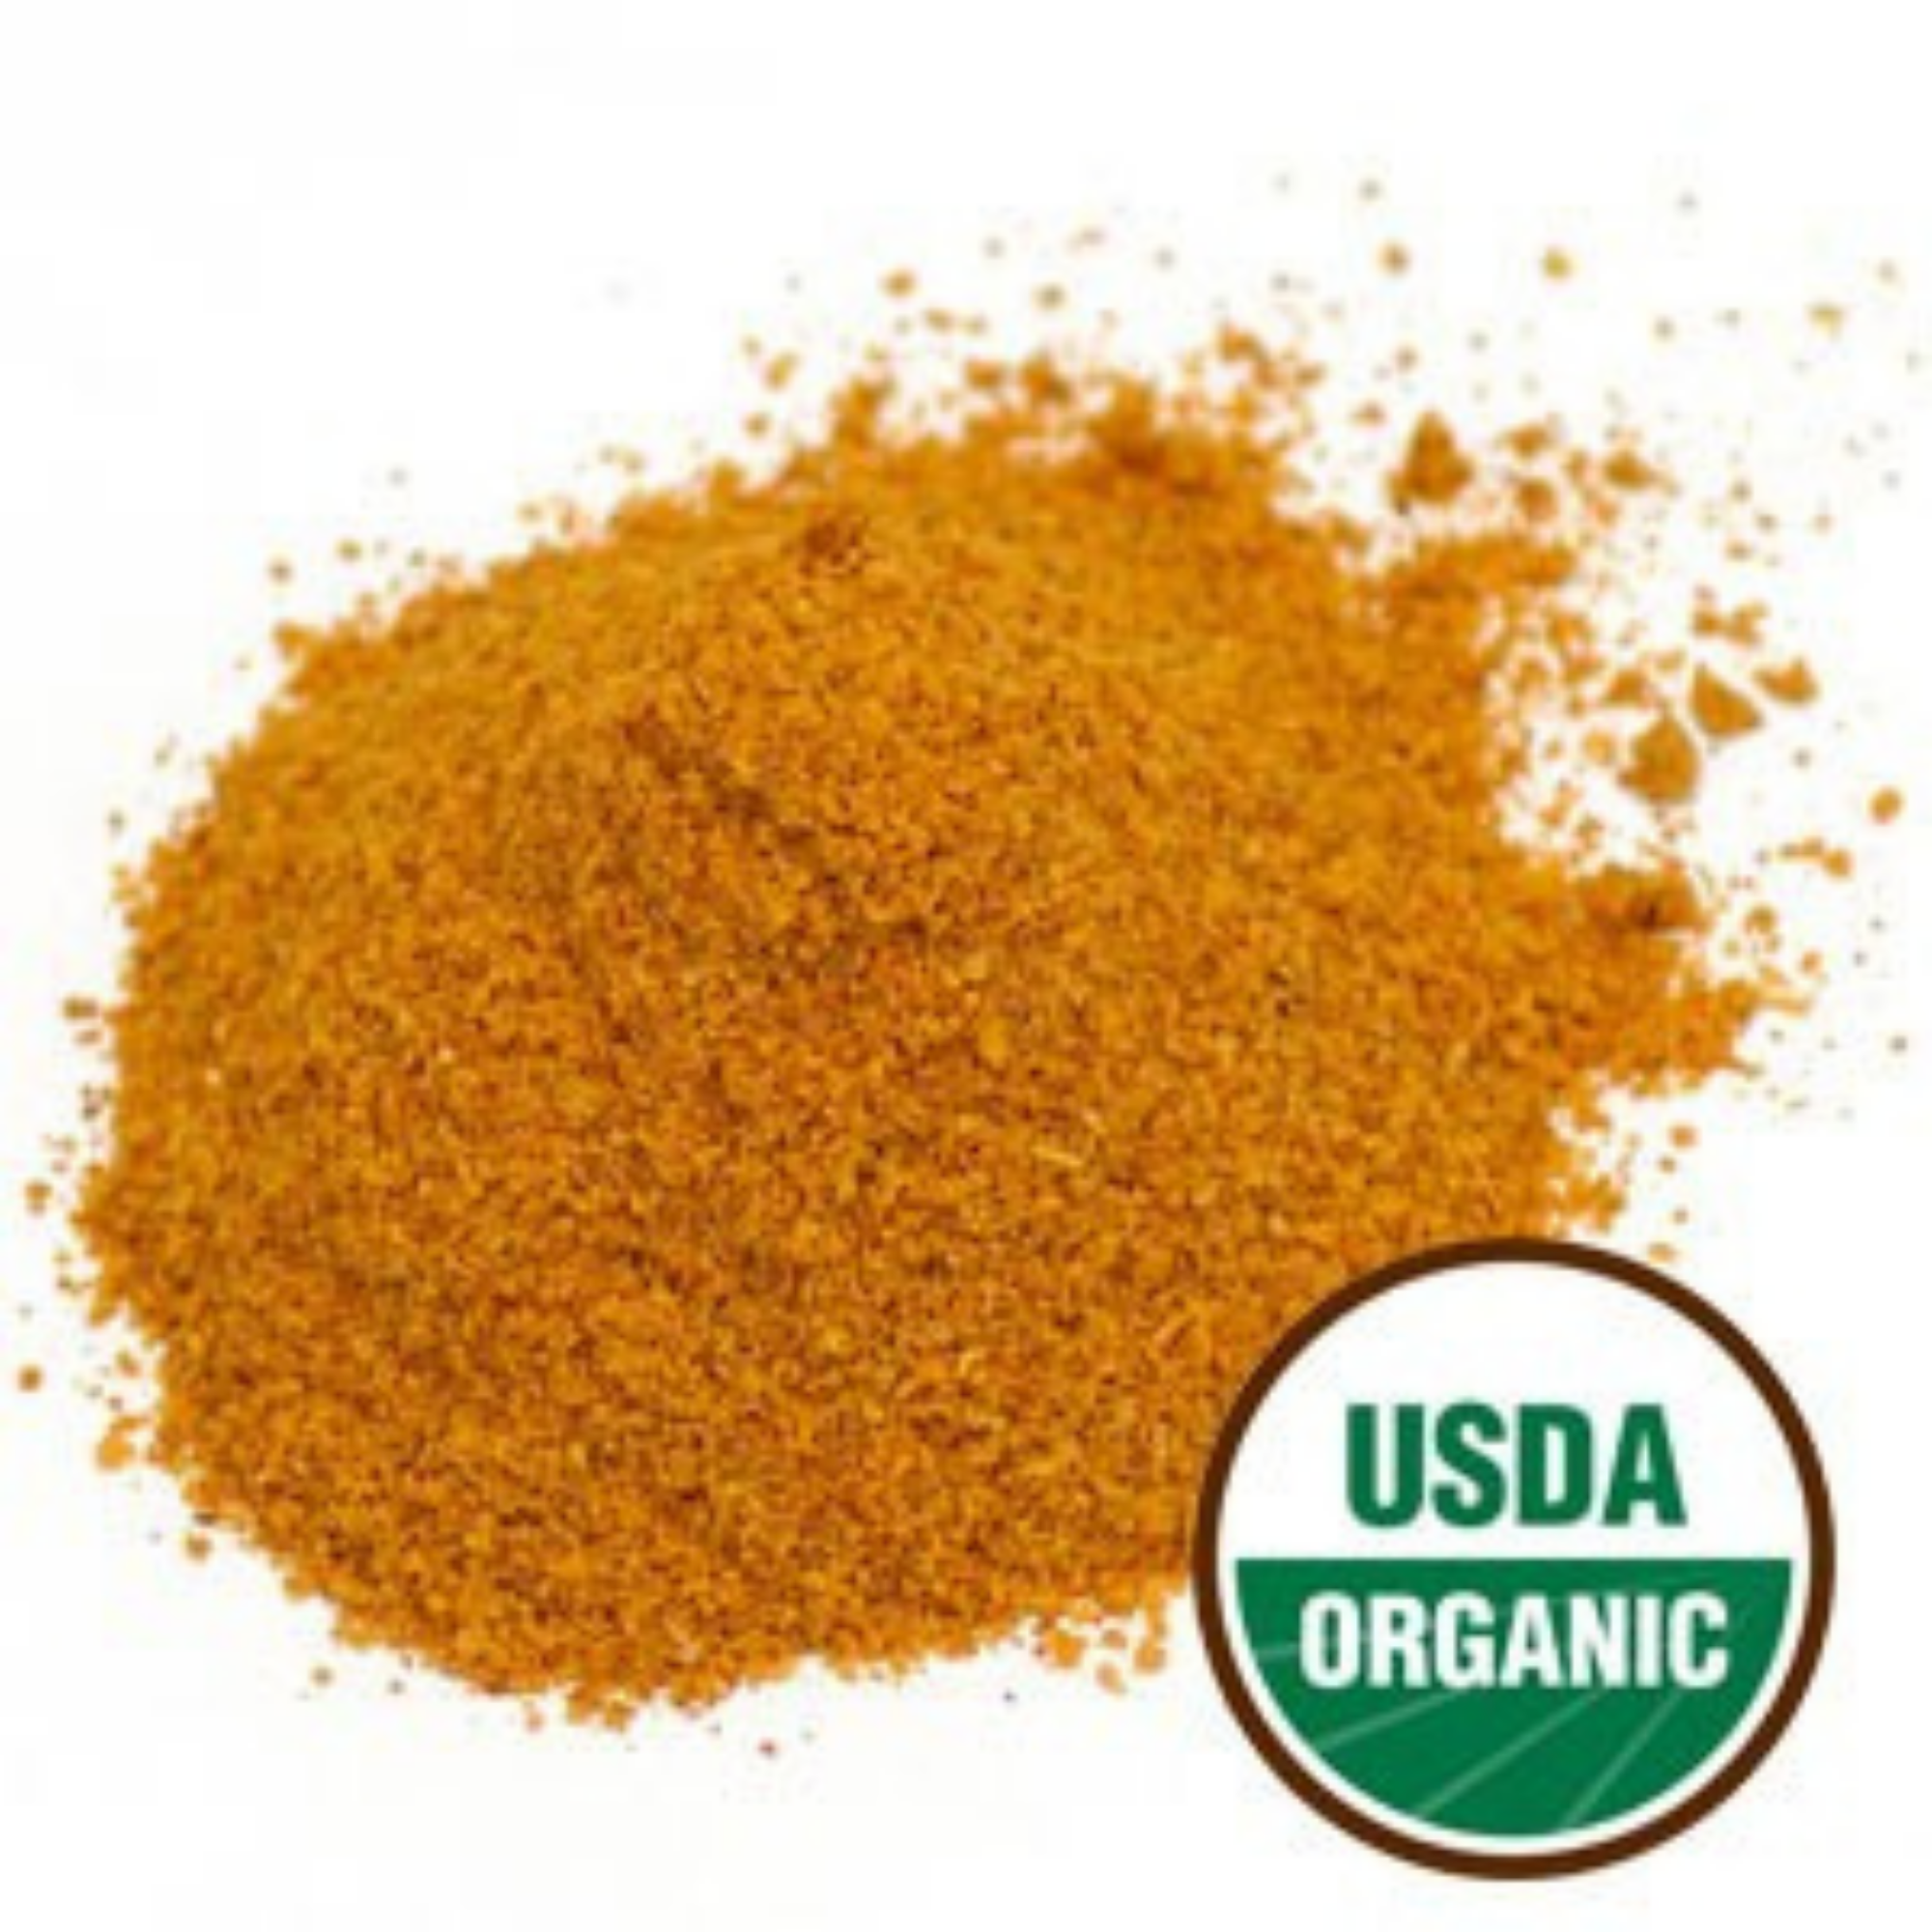 Cayenne Pepper USDA Organic y Millwood Naturals and Organics